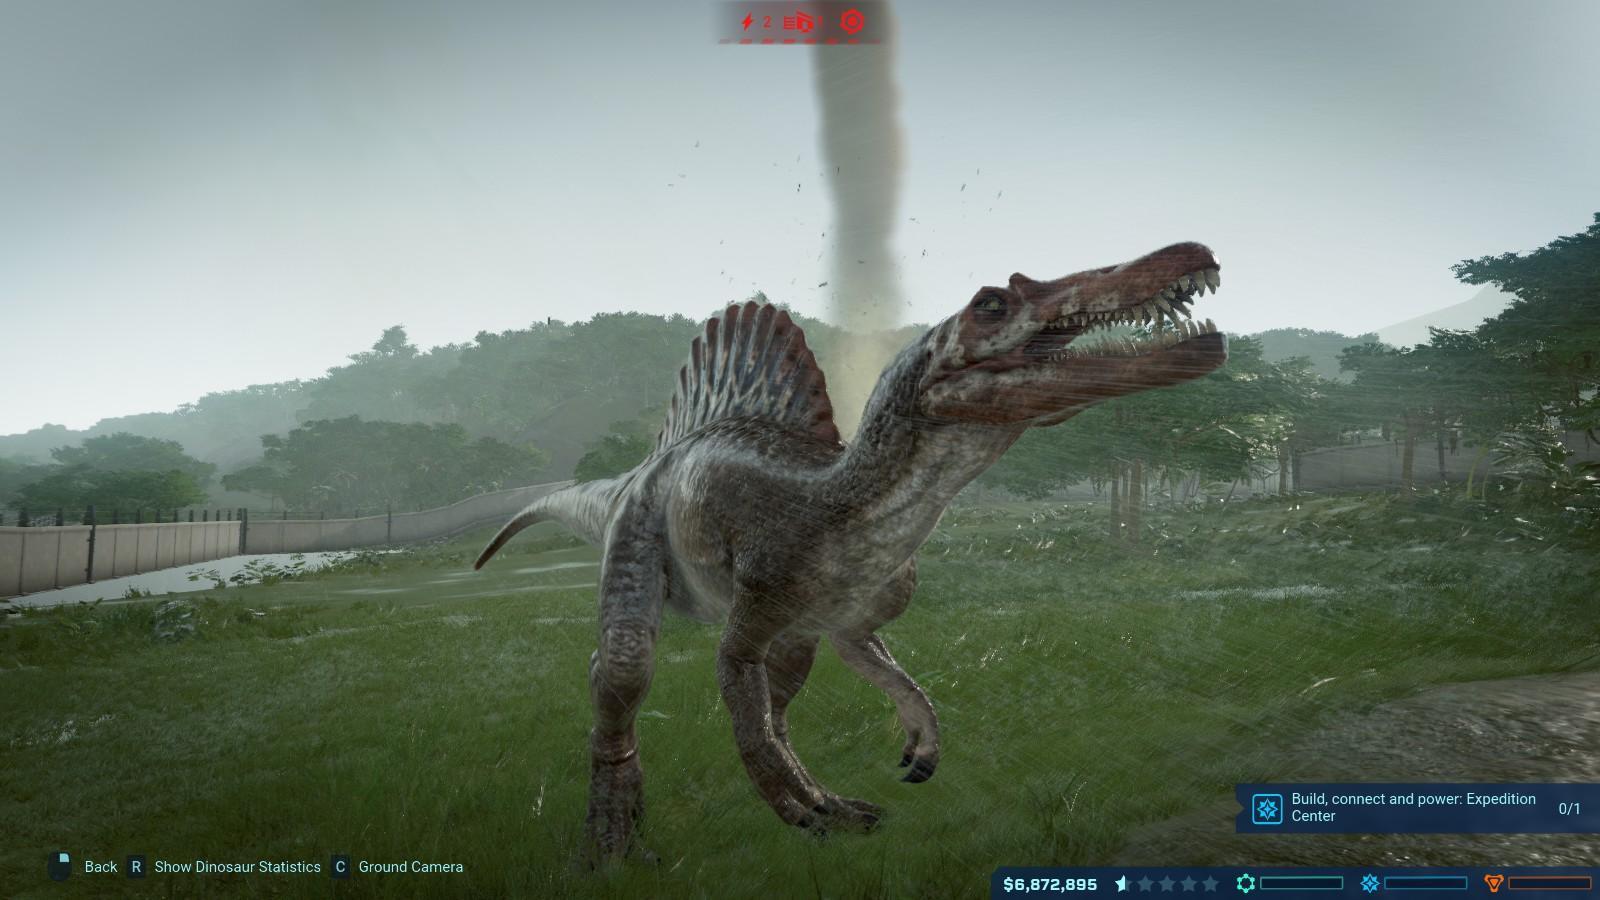 Carnivores Vs Herbivores Dinosaurs